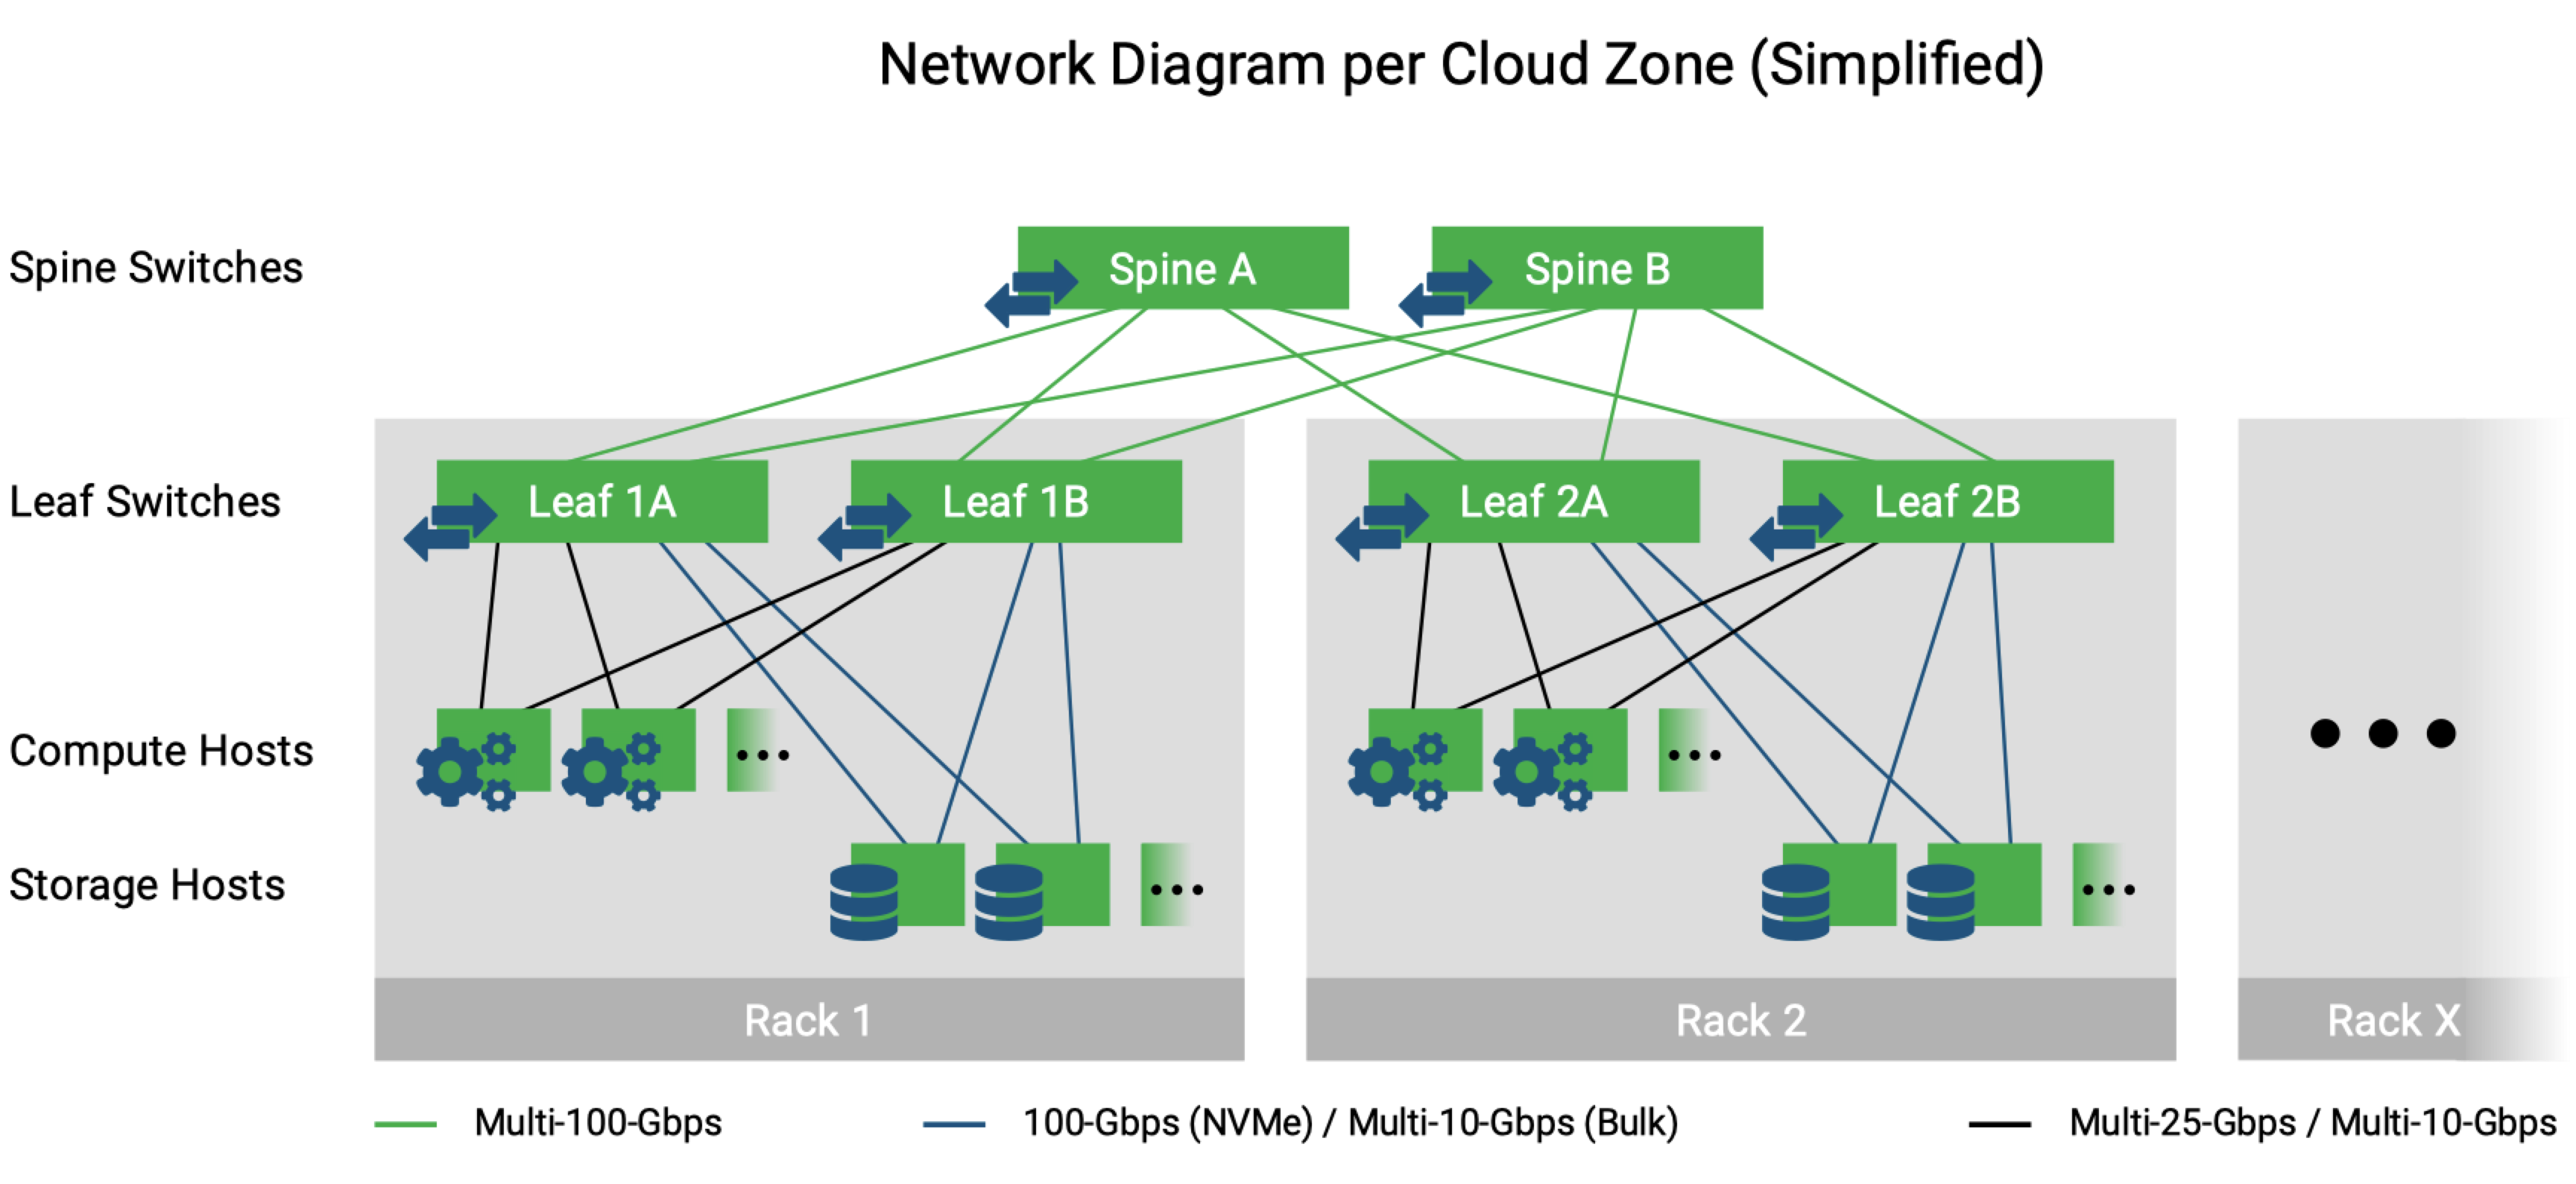 Network Diagram per Cloud Zone (Simplified)